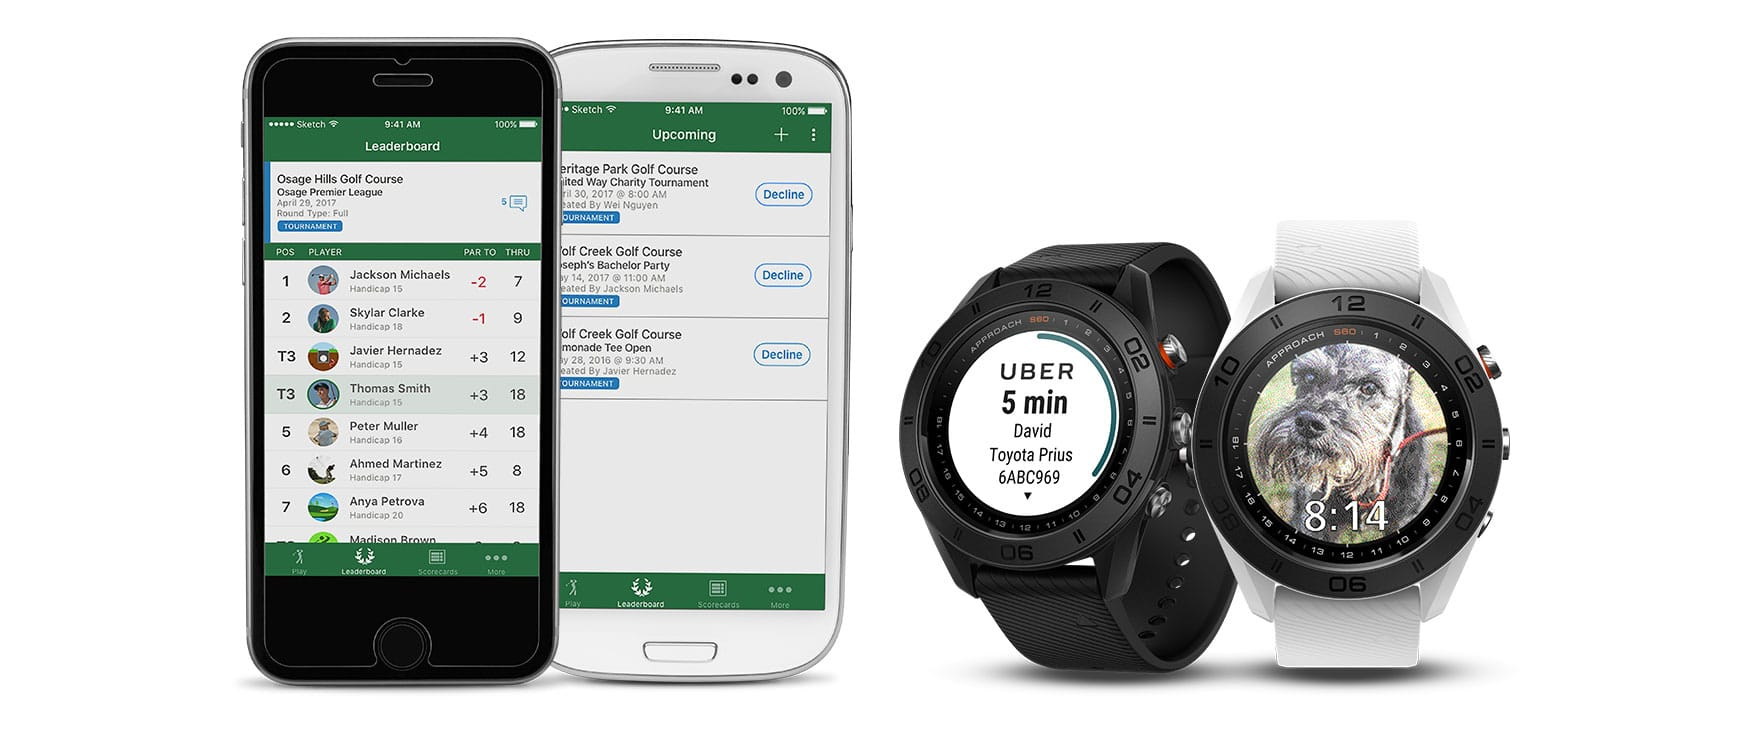 garmin approach s60 golf watch comes jam packed with features 2 - Garmin Approach S60 golf watch comes jam-packed with features